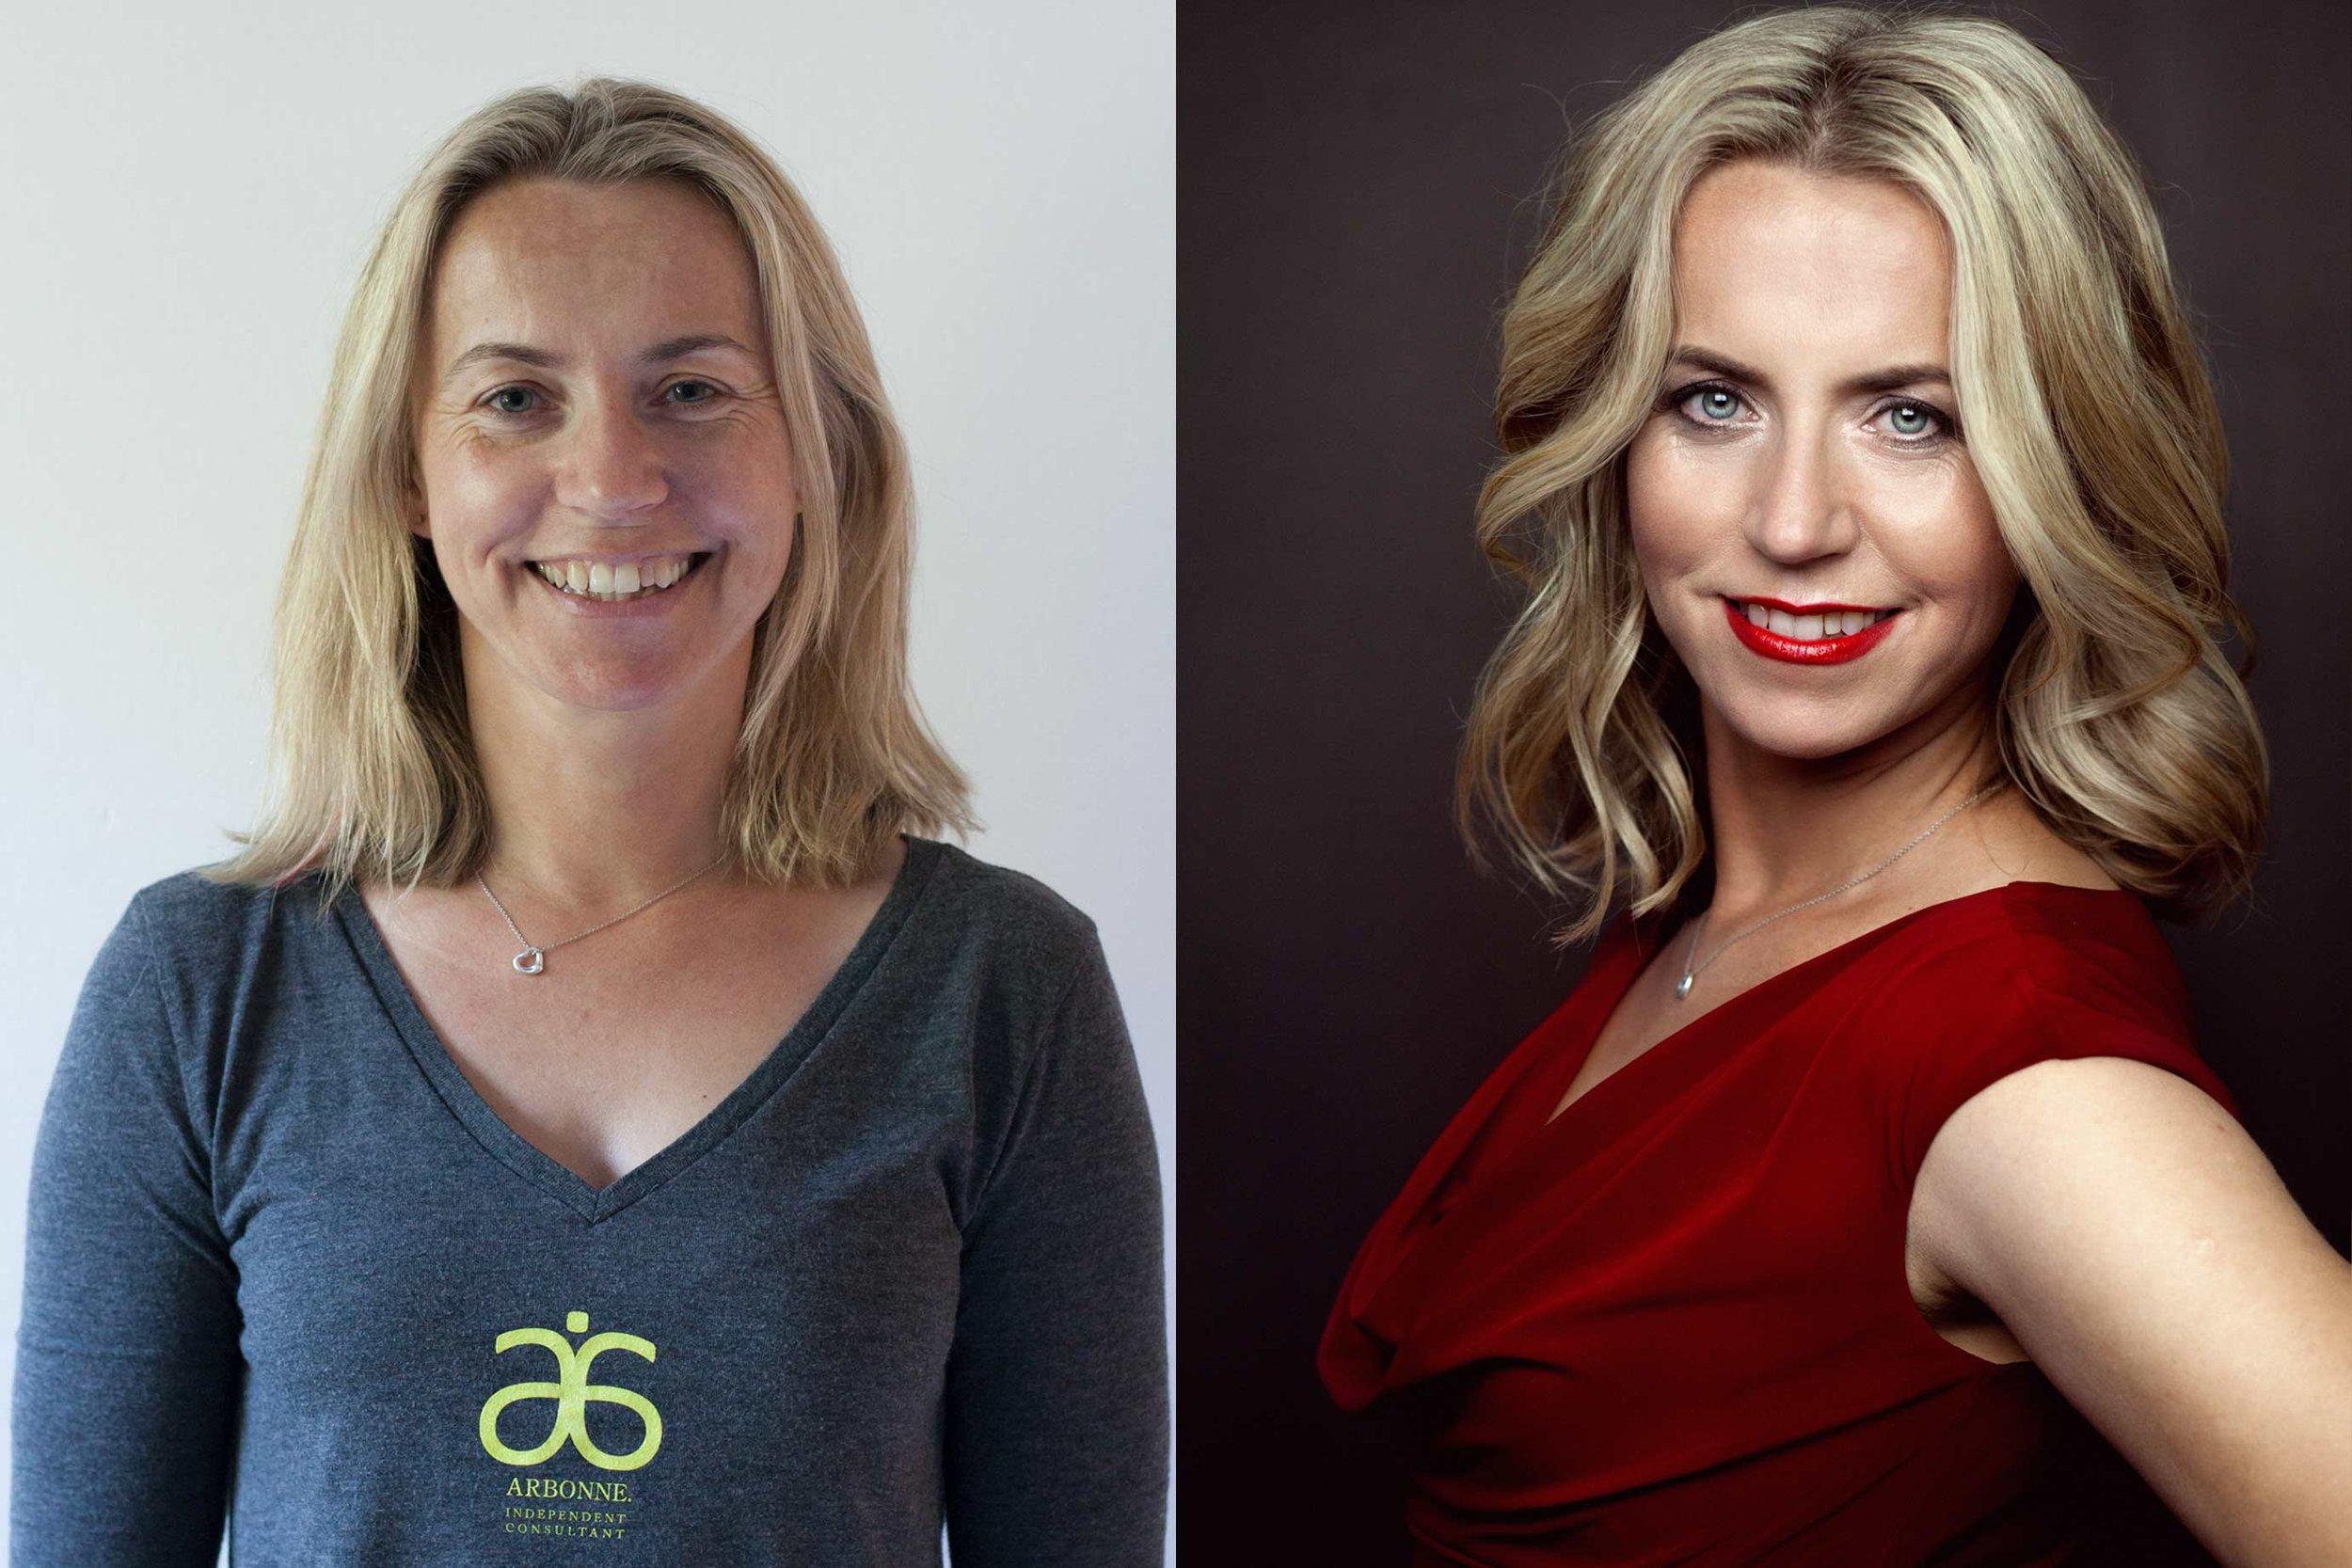 Kati-before-afters.jpg